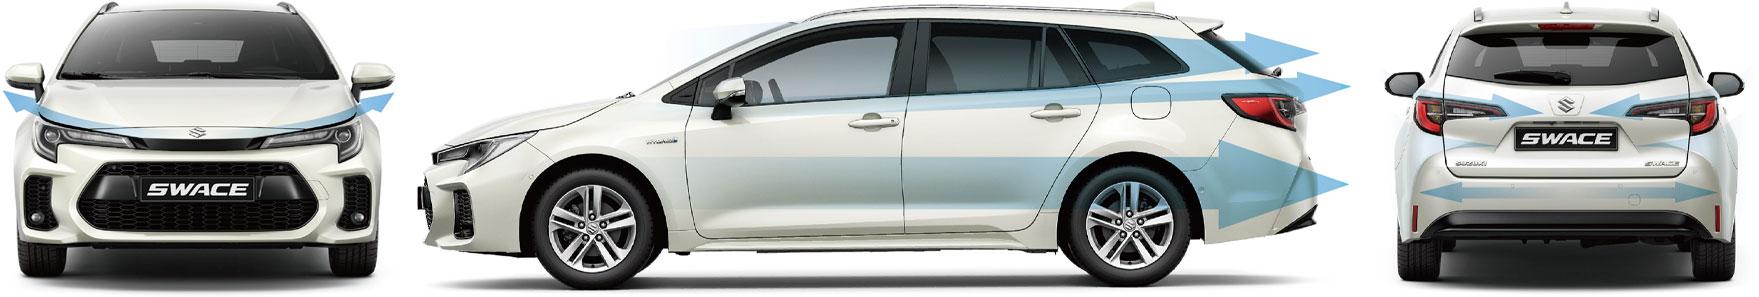 Dynamic Exterior Suzuki Swace 2020